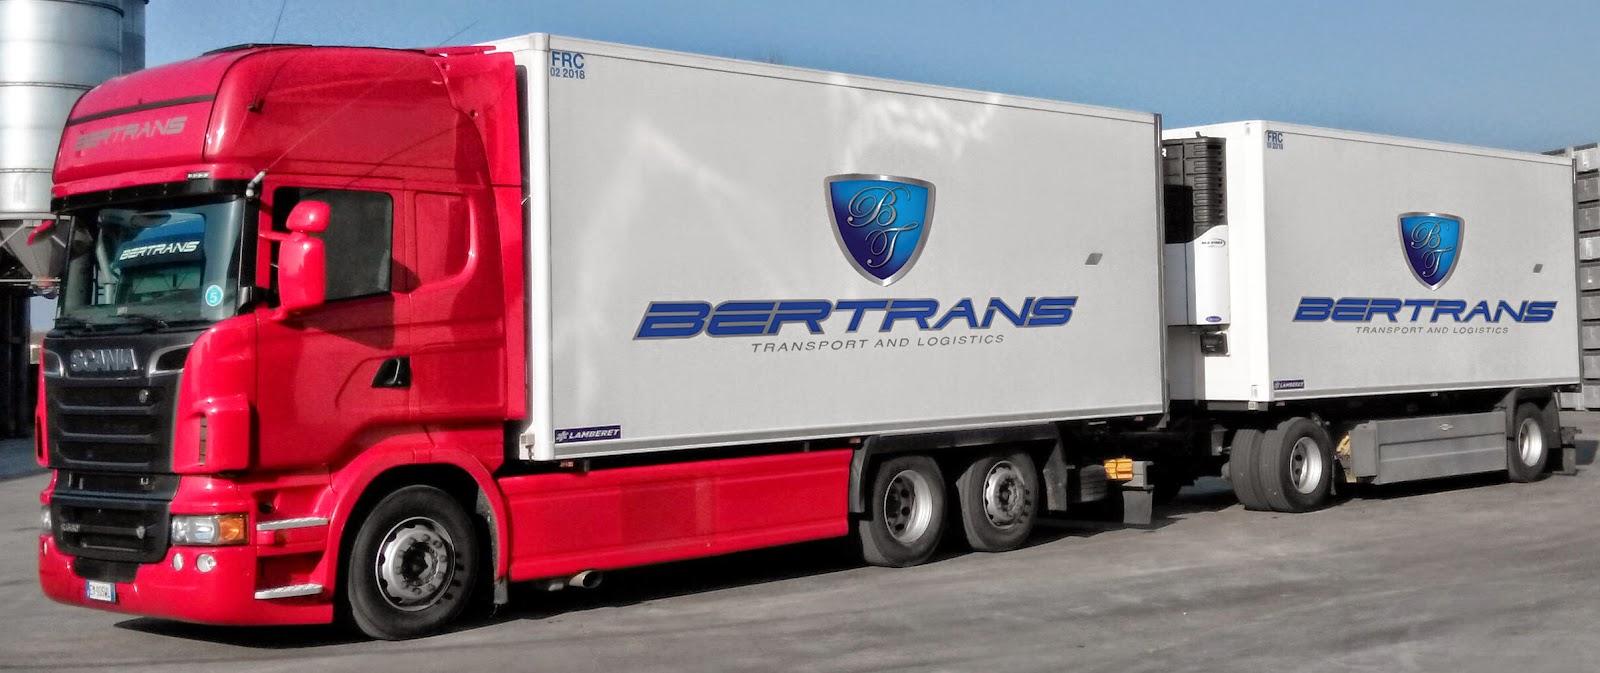 Spedizioni Internazionali Bertrans : AUTOTRASPORTI E LOGISTICA BERTRANS SRL